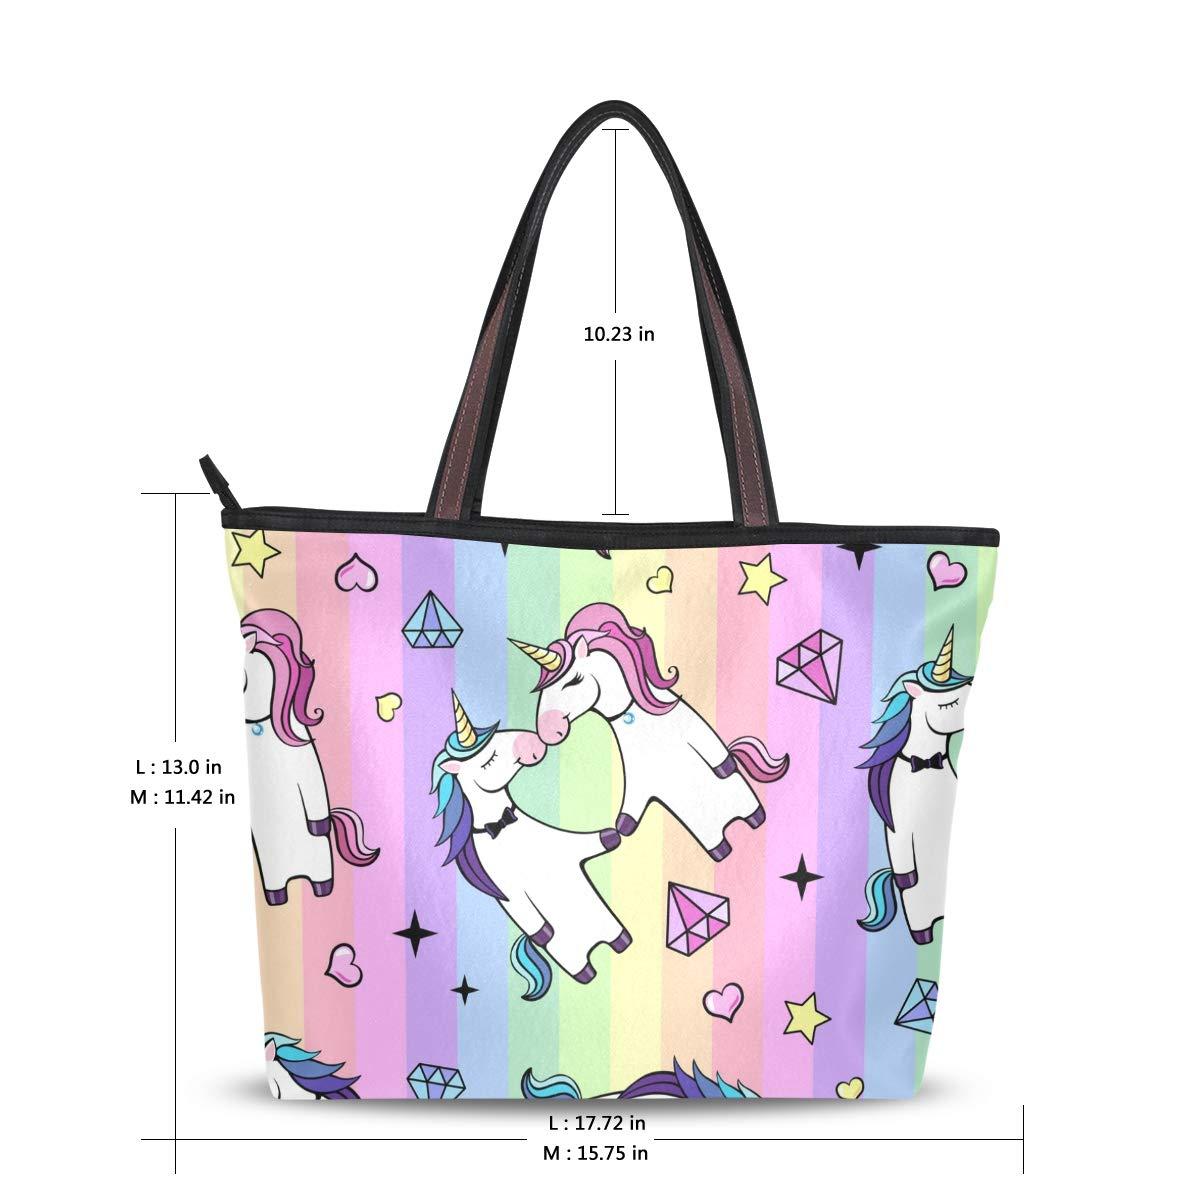 Tote Bag Valentines Day Unicorn Heart Rainbow Handbag Satchel with Shoulder Length Handles for Women